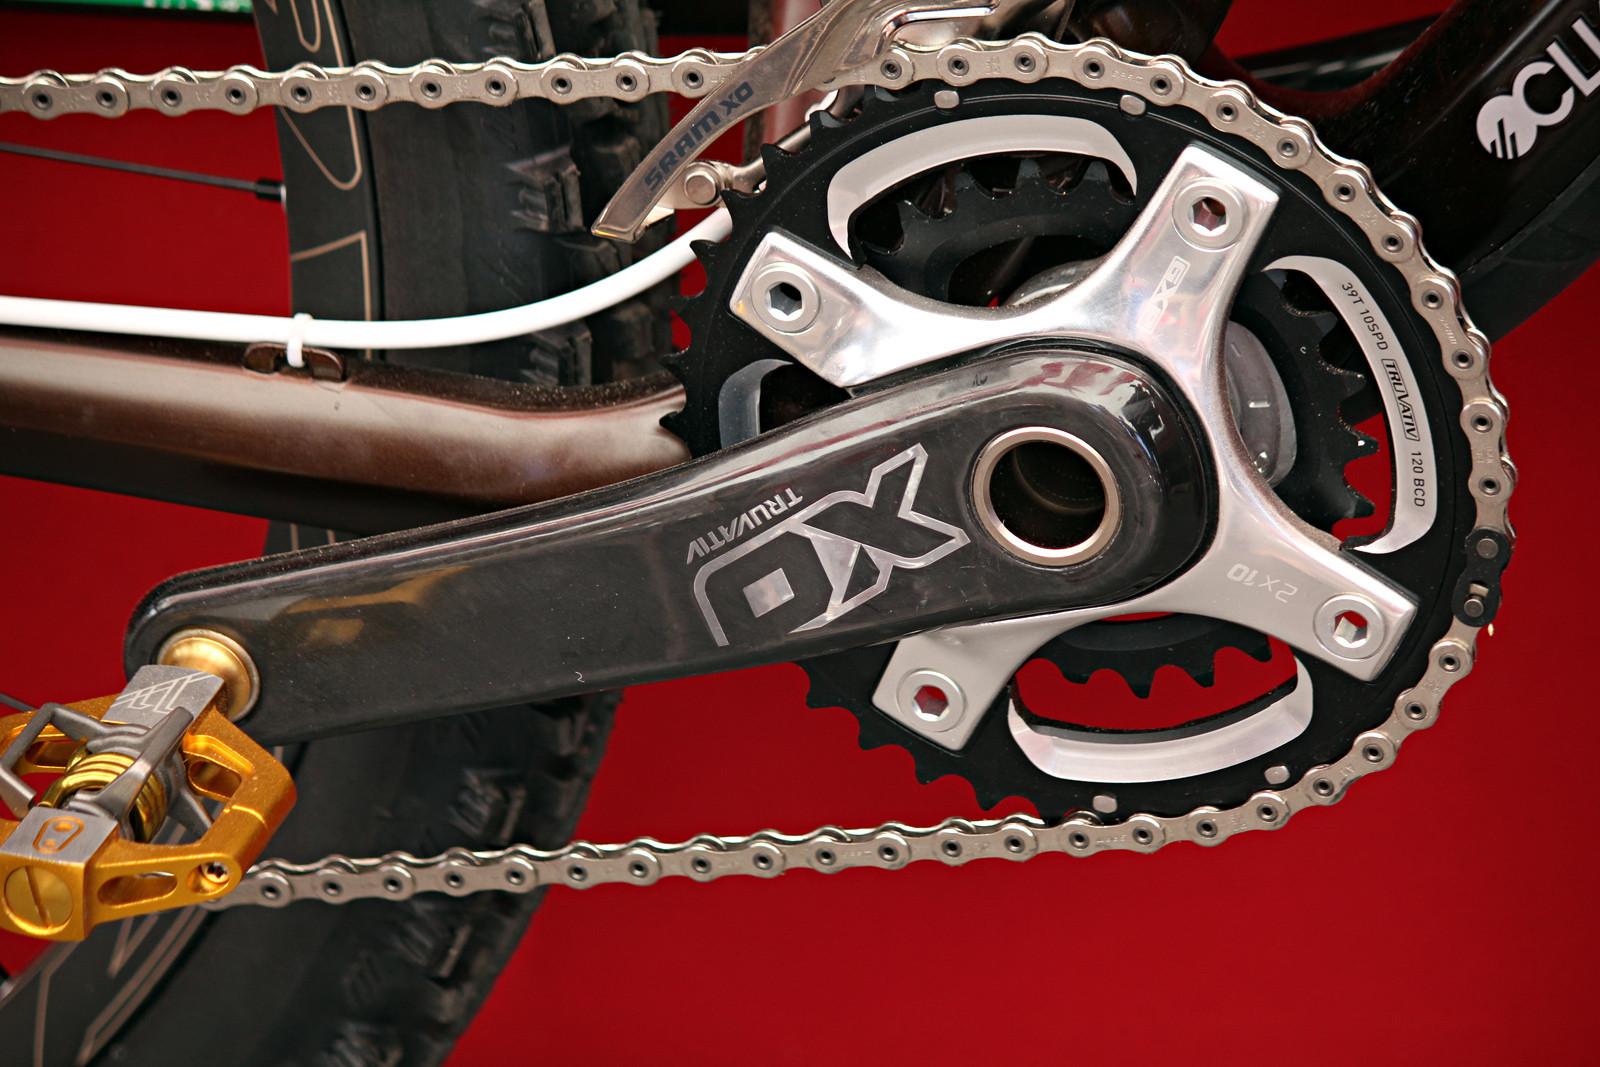 SRAM Launch - XO Crank - Sea Otter Pit Bits from gordo, Day 2 - Mountain Biking Pictures - Vital MTB